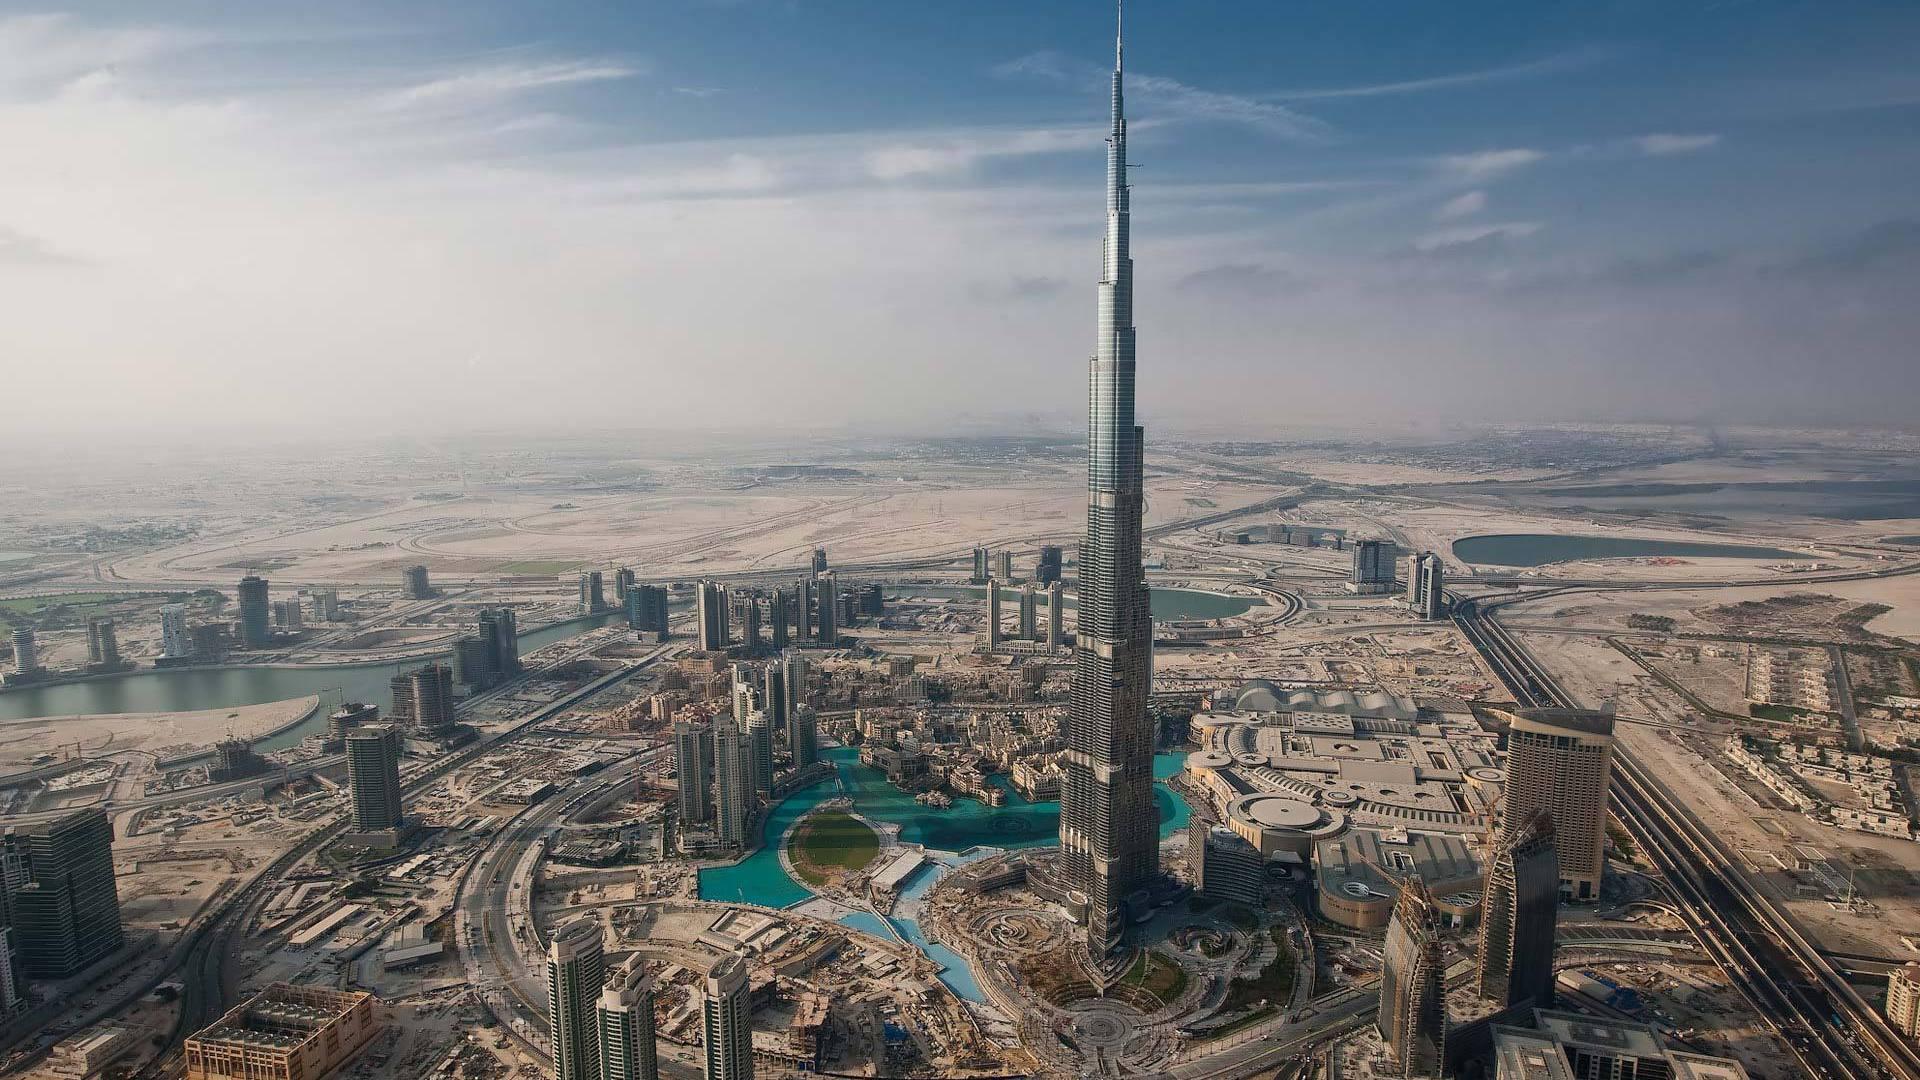 Burj Khalifa Hd Photos: Burj Khalifa Wallpapers